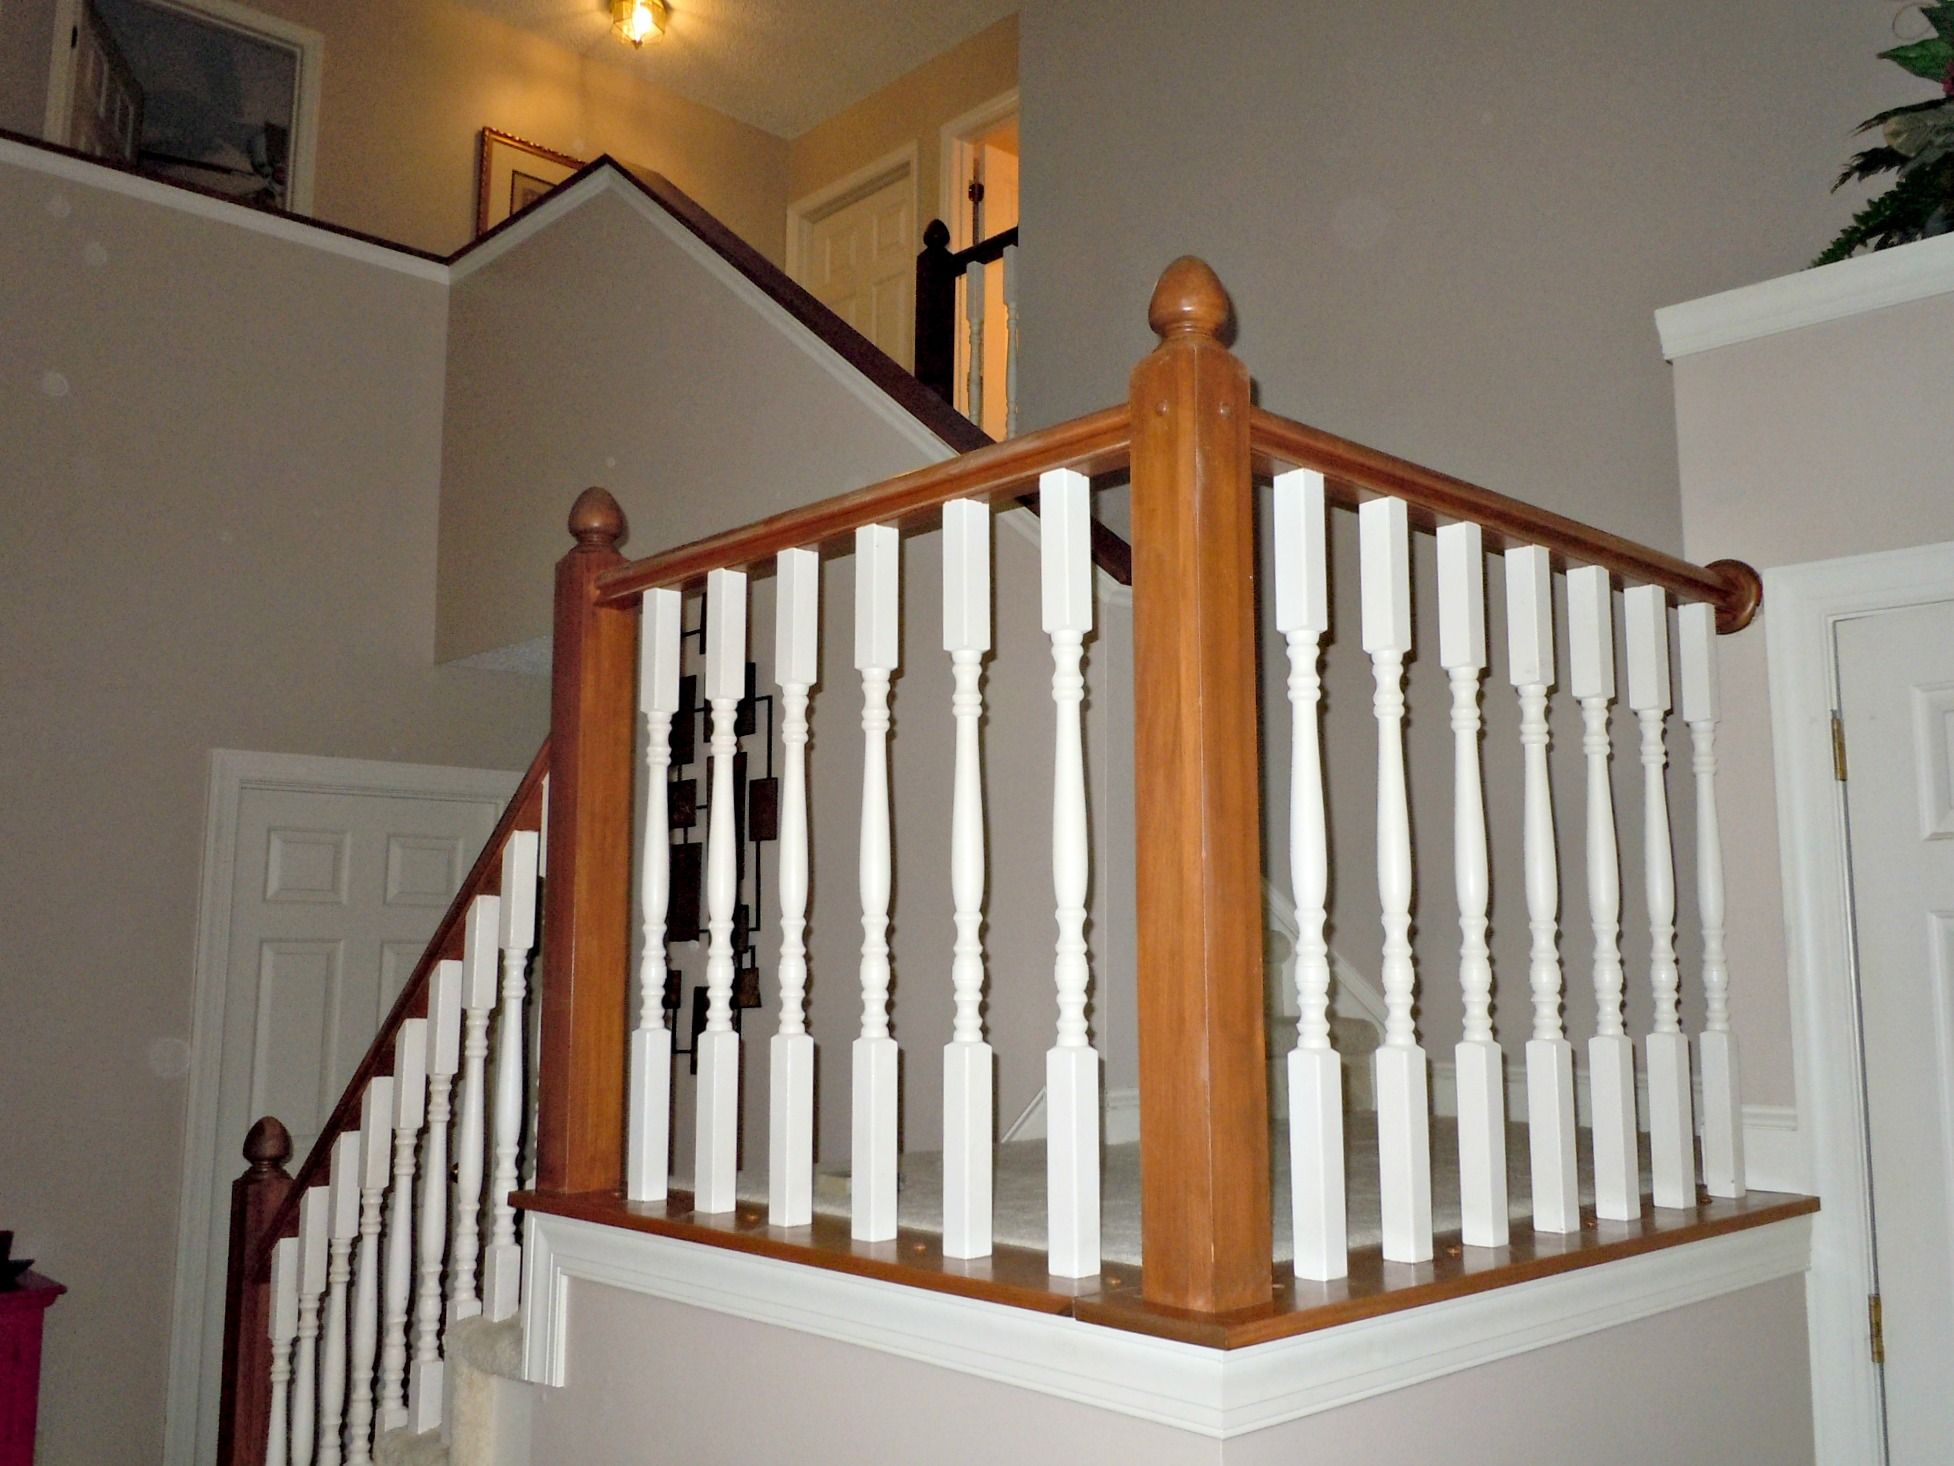 Builder Grade Oak Stair Railing Makeover Using Gel Stain Semi